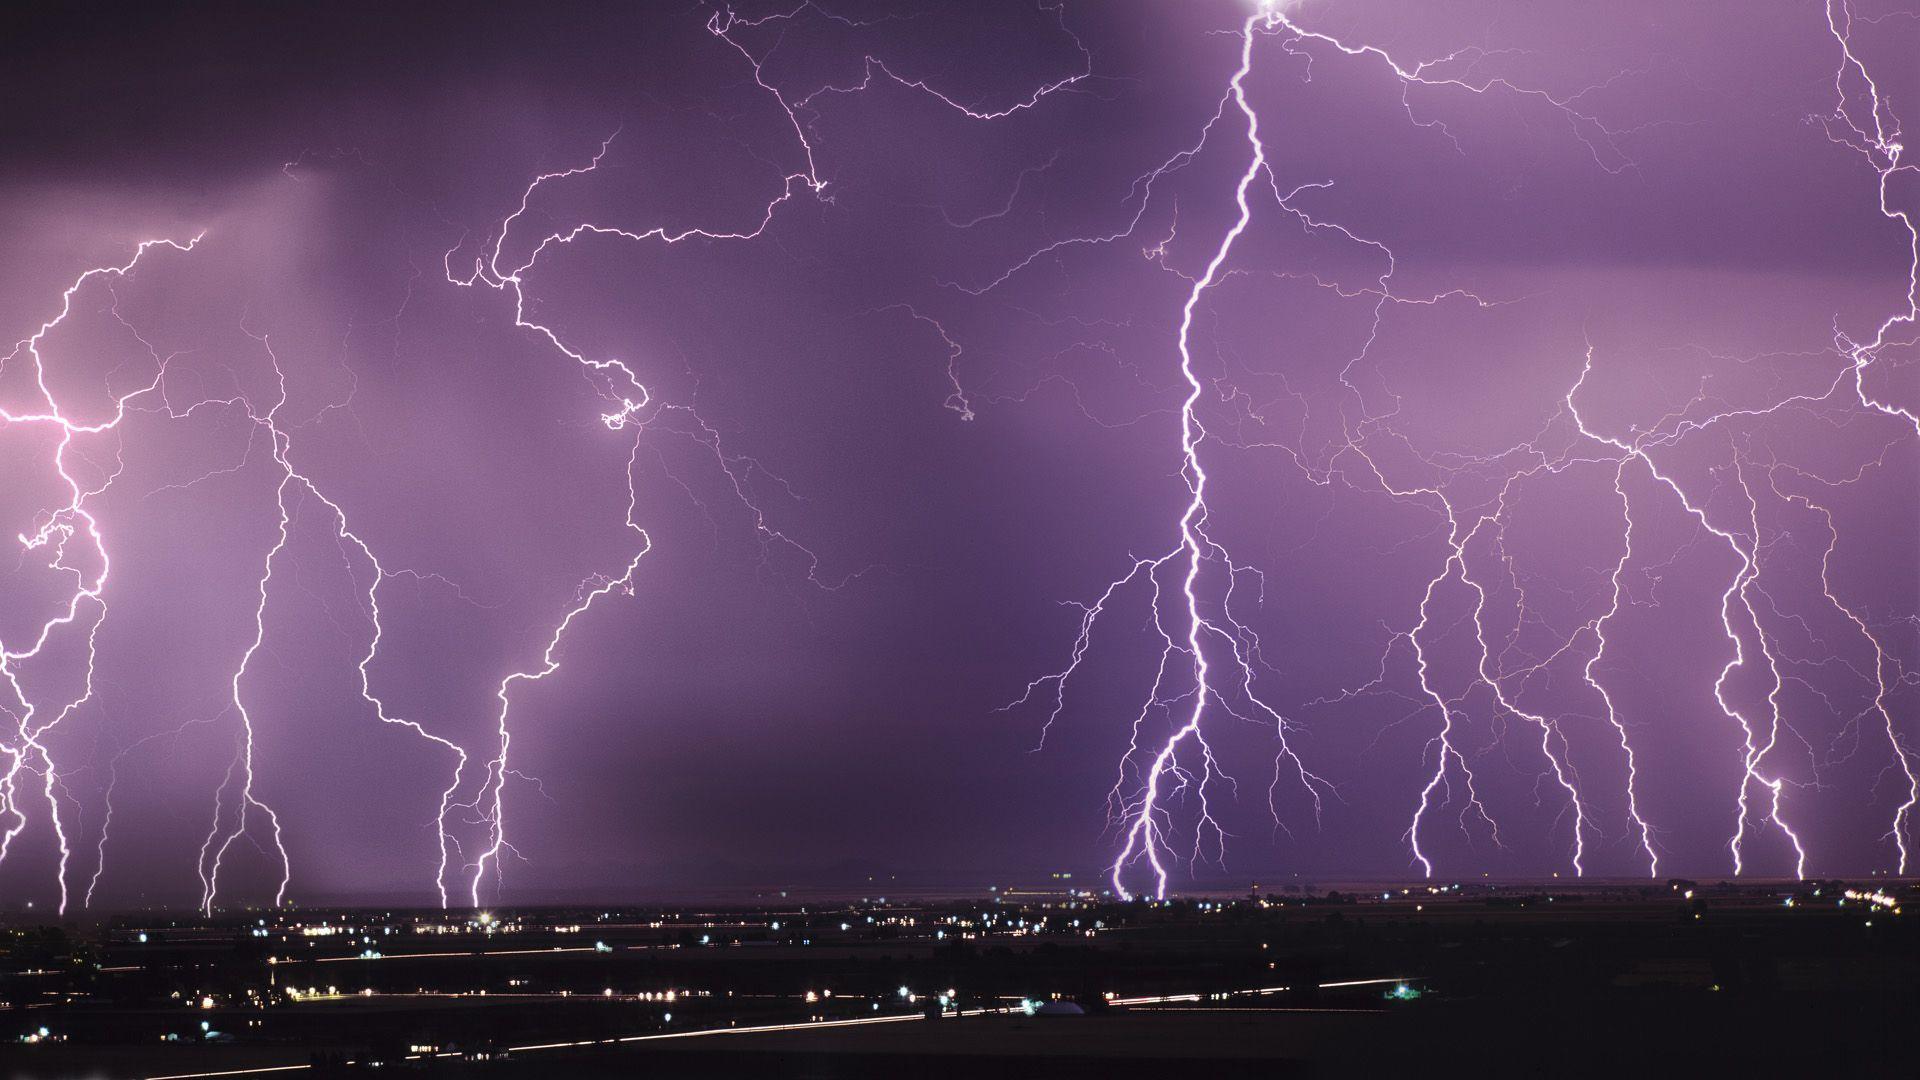 Lightning Wallpapers - Top Free Lightning Backgrounds